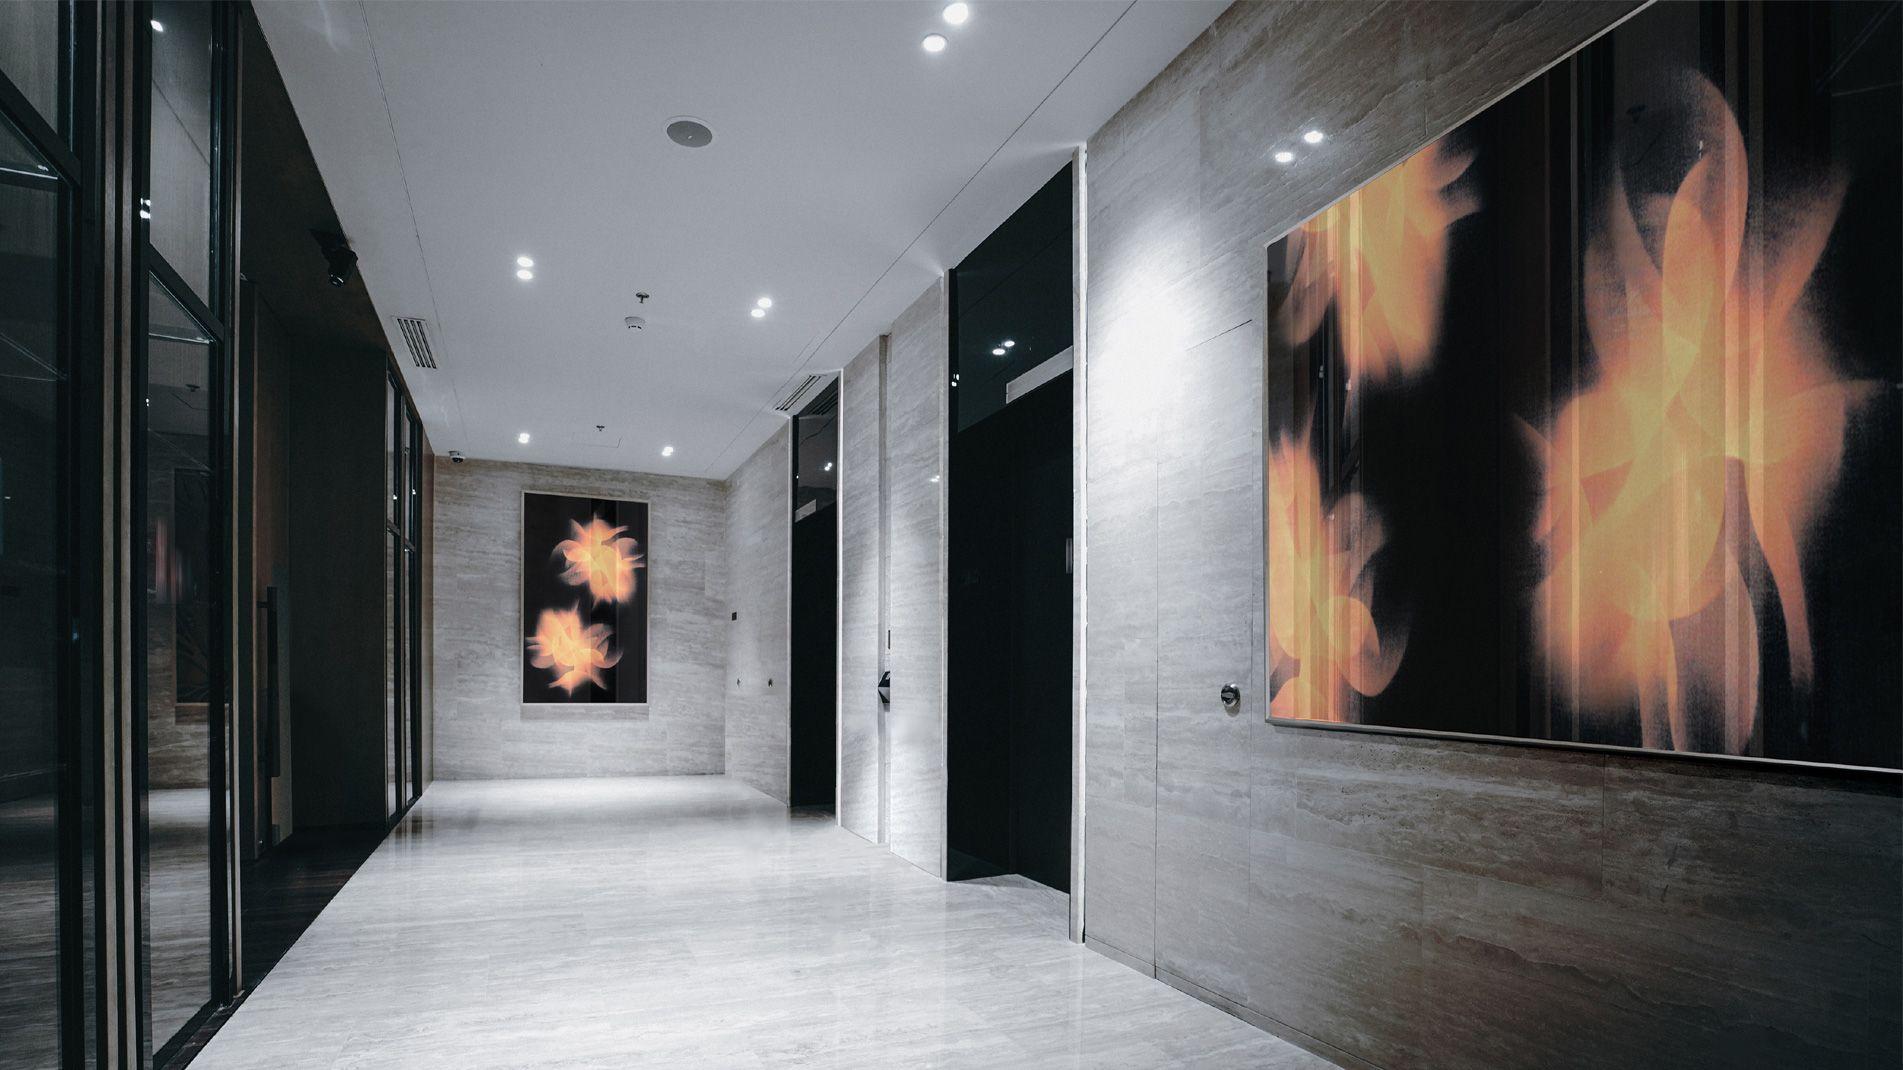 Guillaume Bottazzi, environmental art in London, enamels on glasses, realized in situ in London